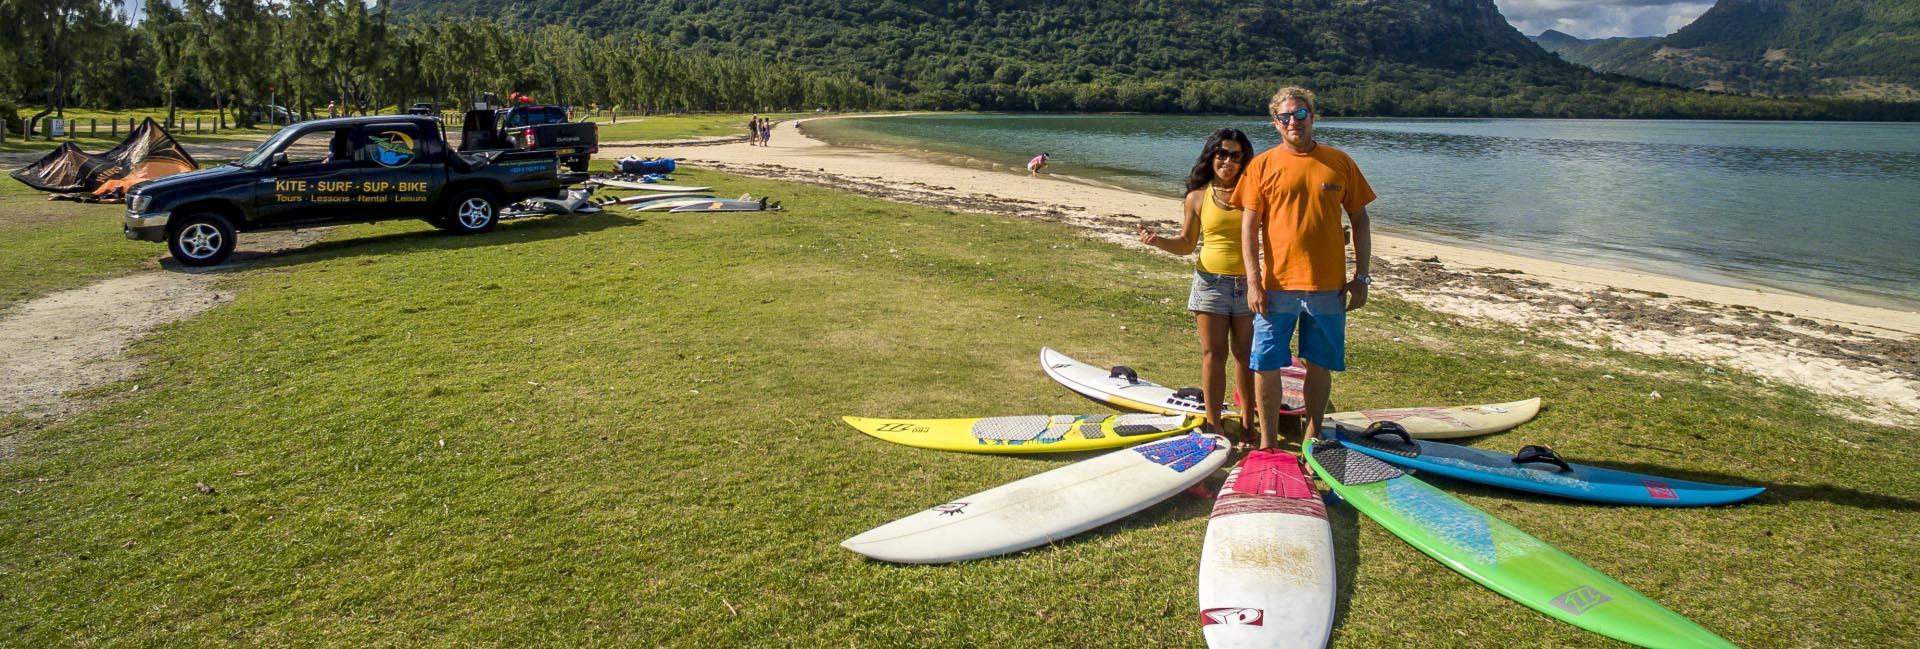 kite-equipment-rental-hangloose